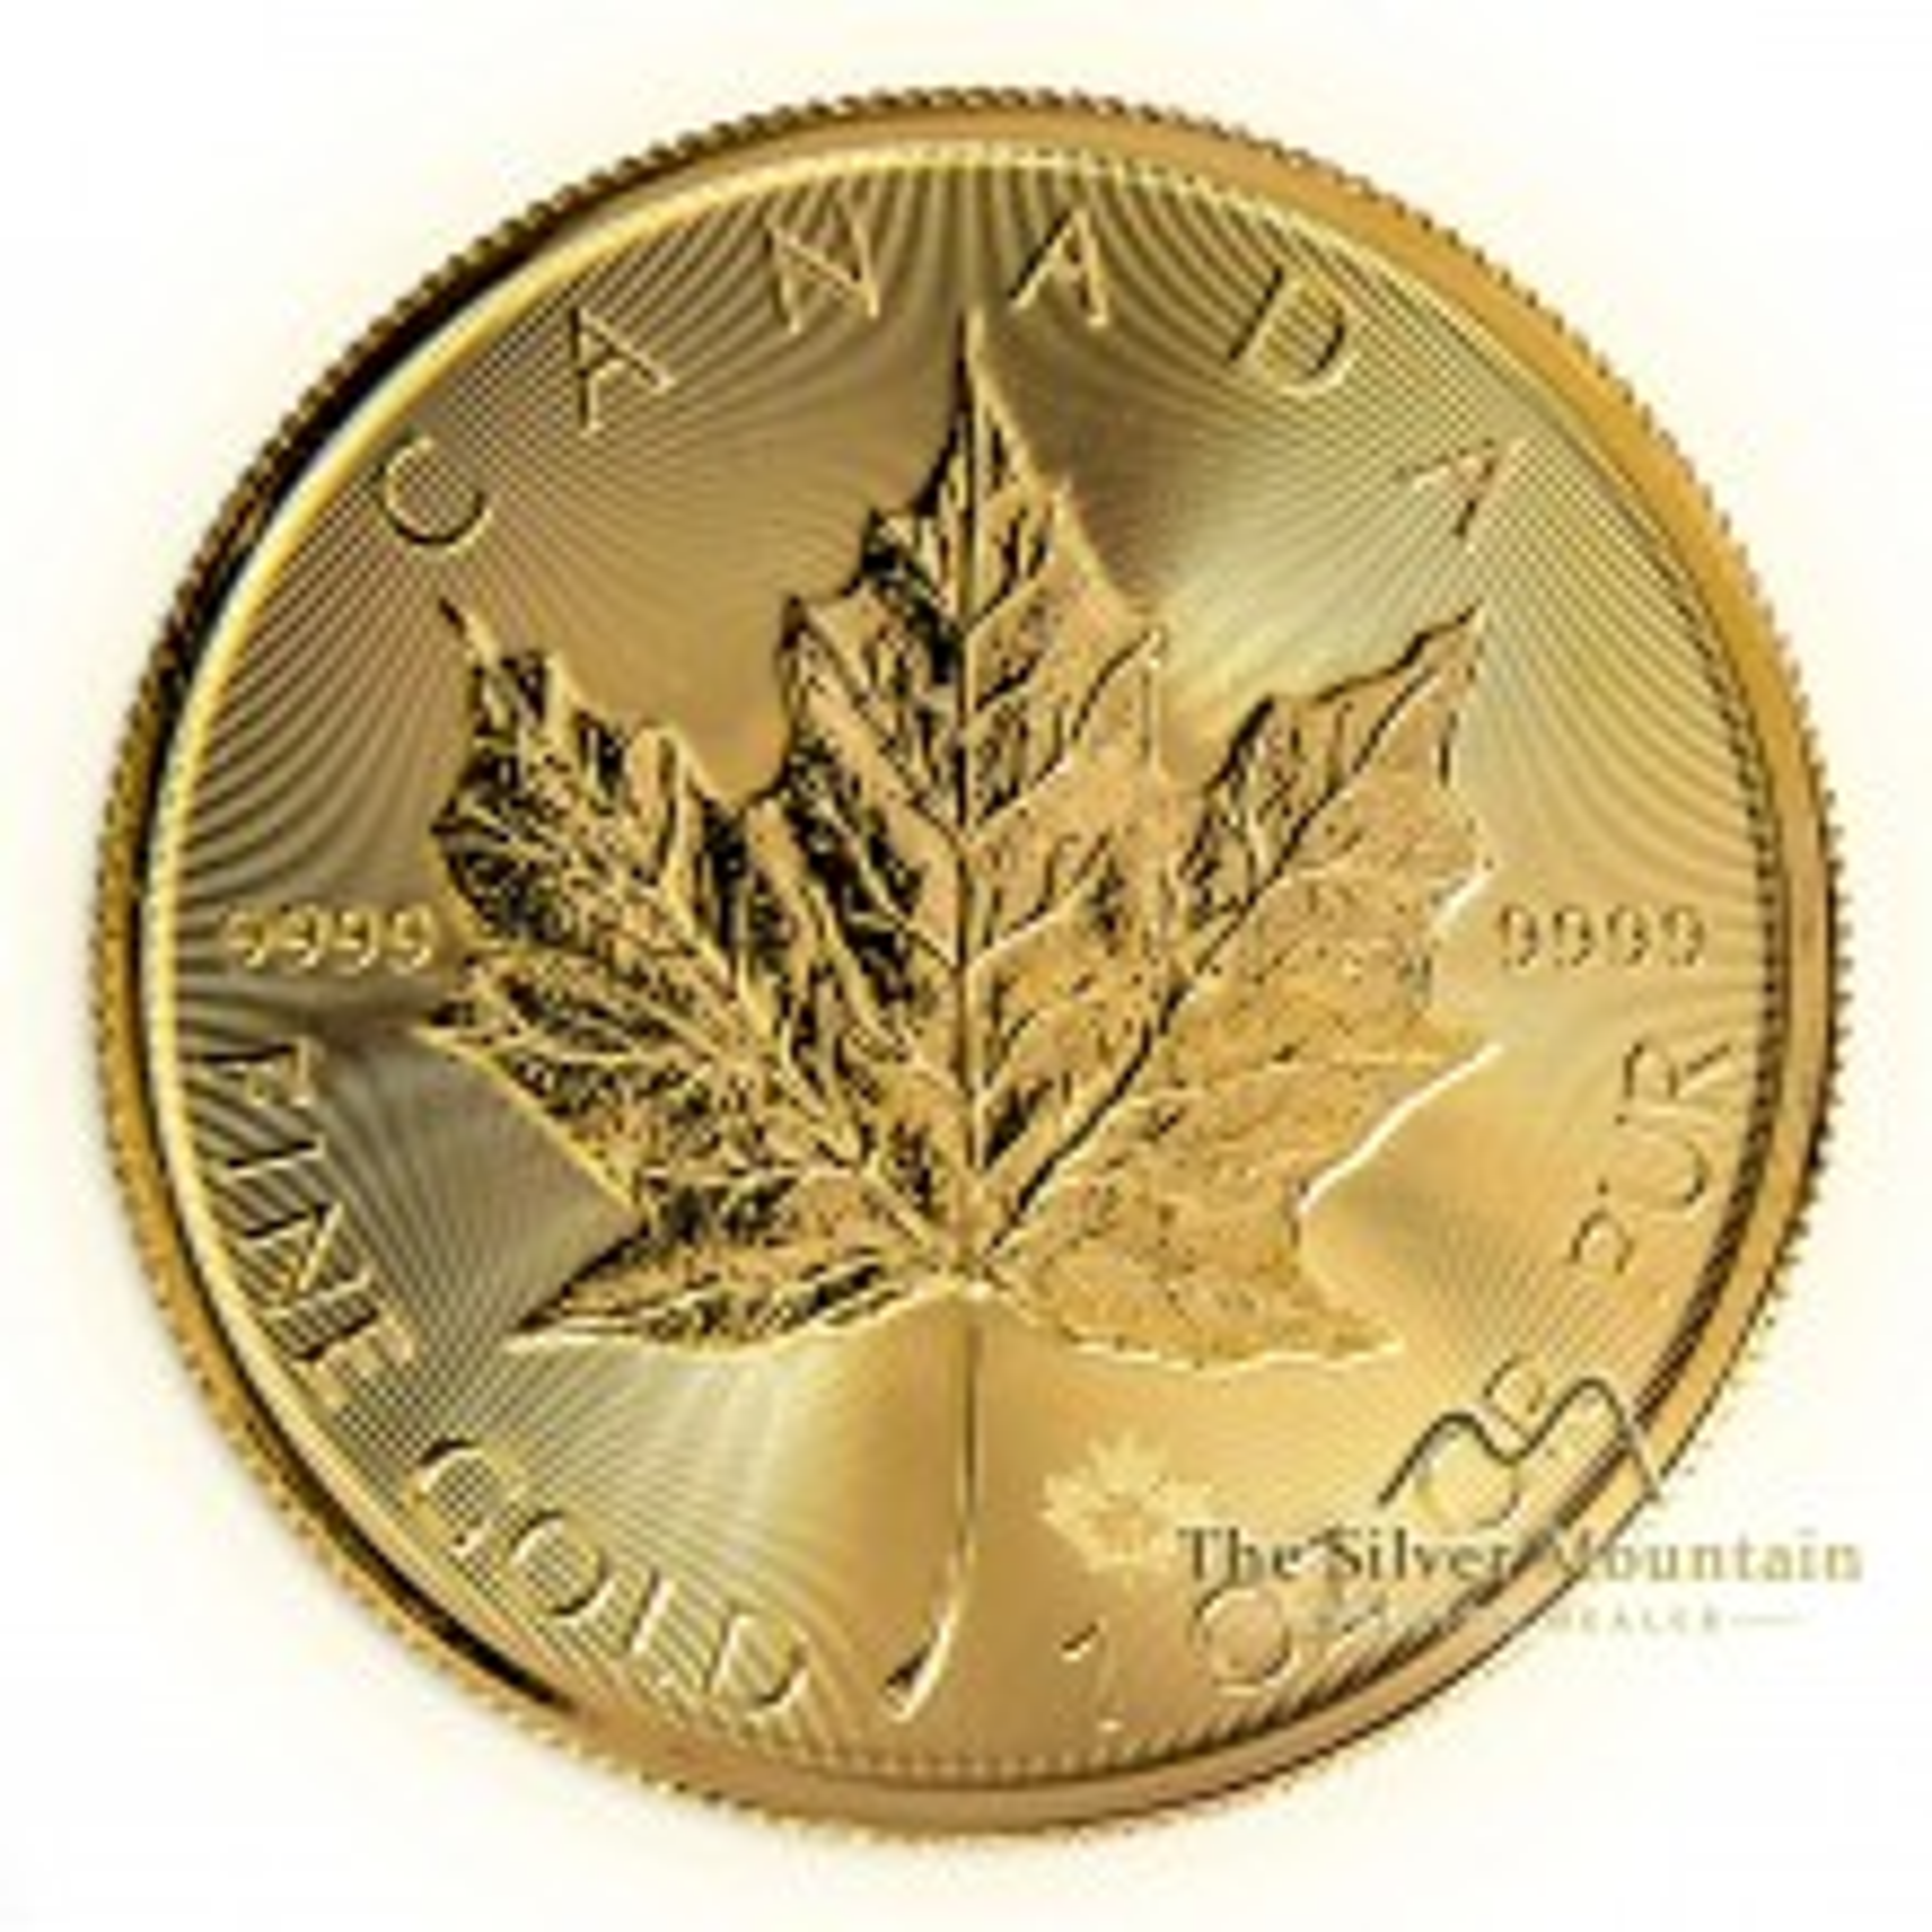 1 troy ounce gouden Maple Leaf munt 2019